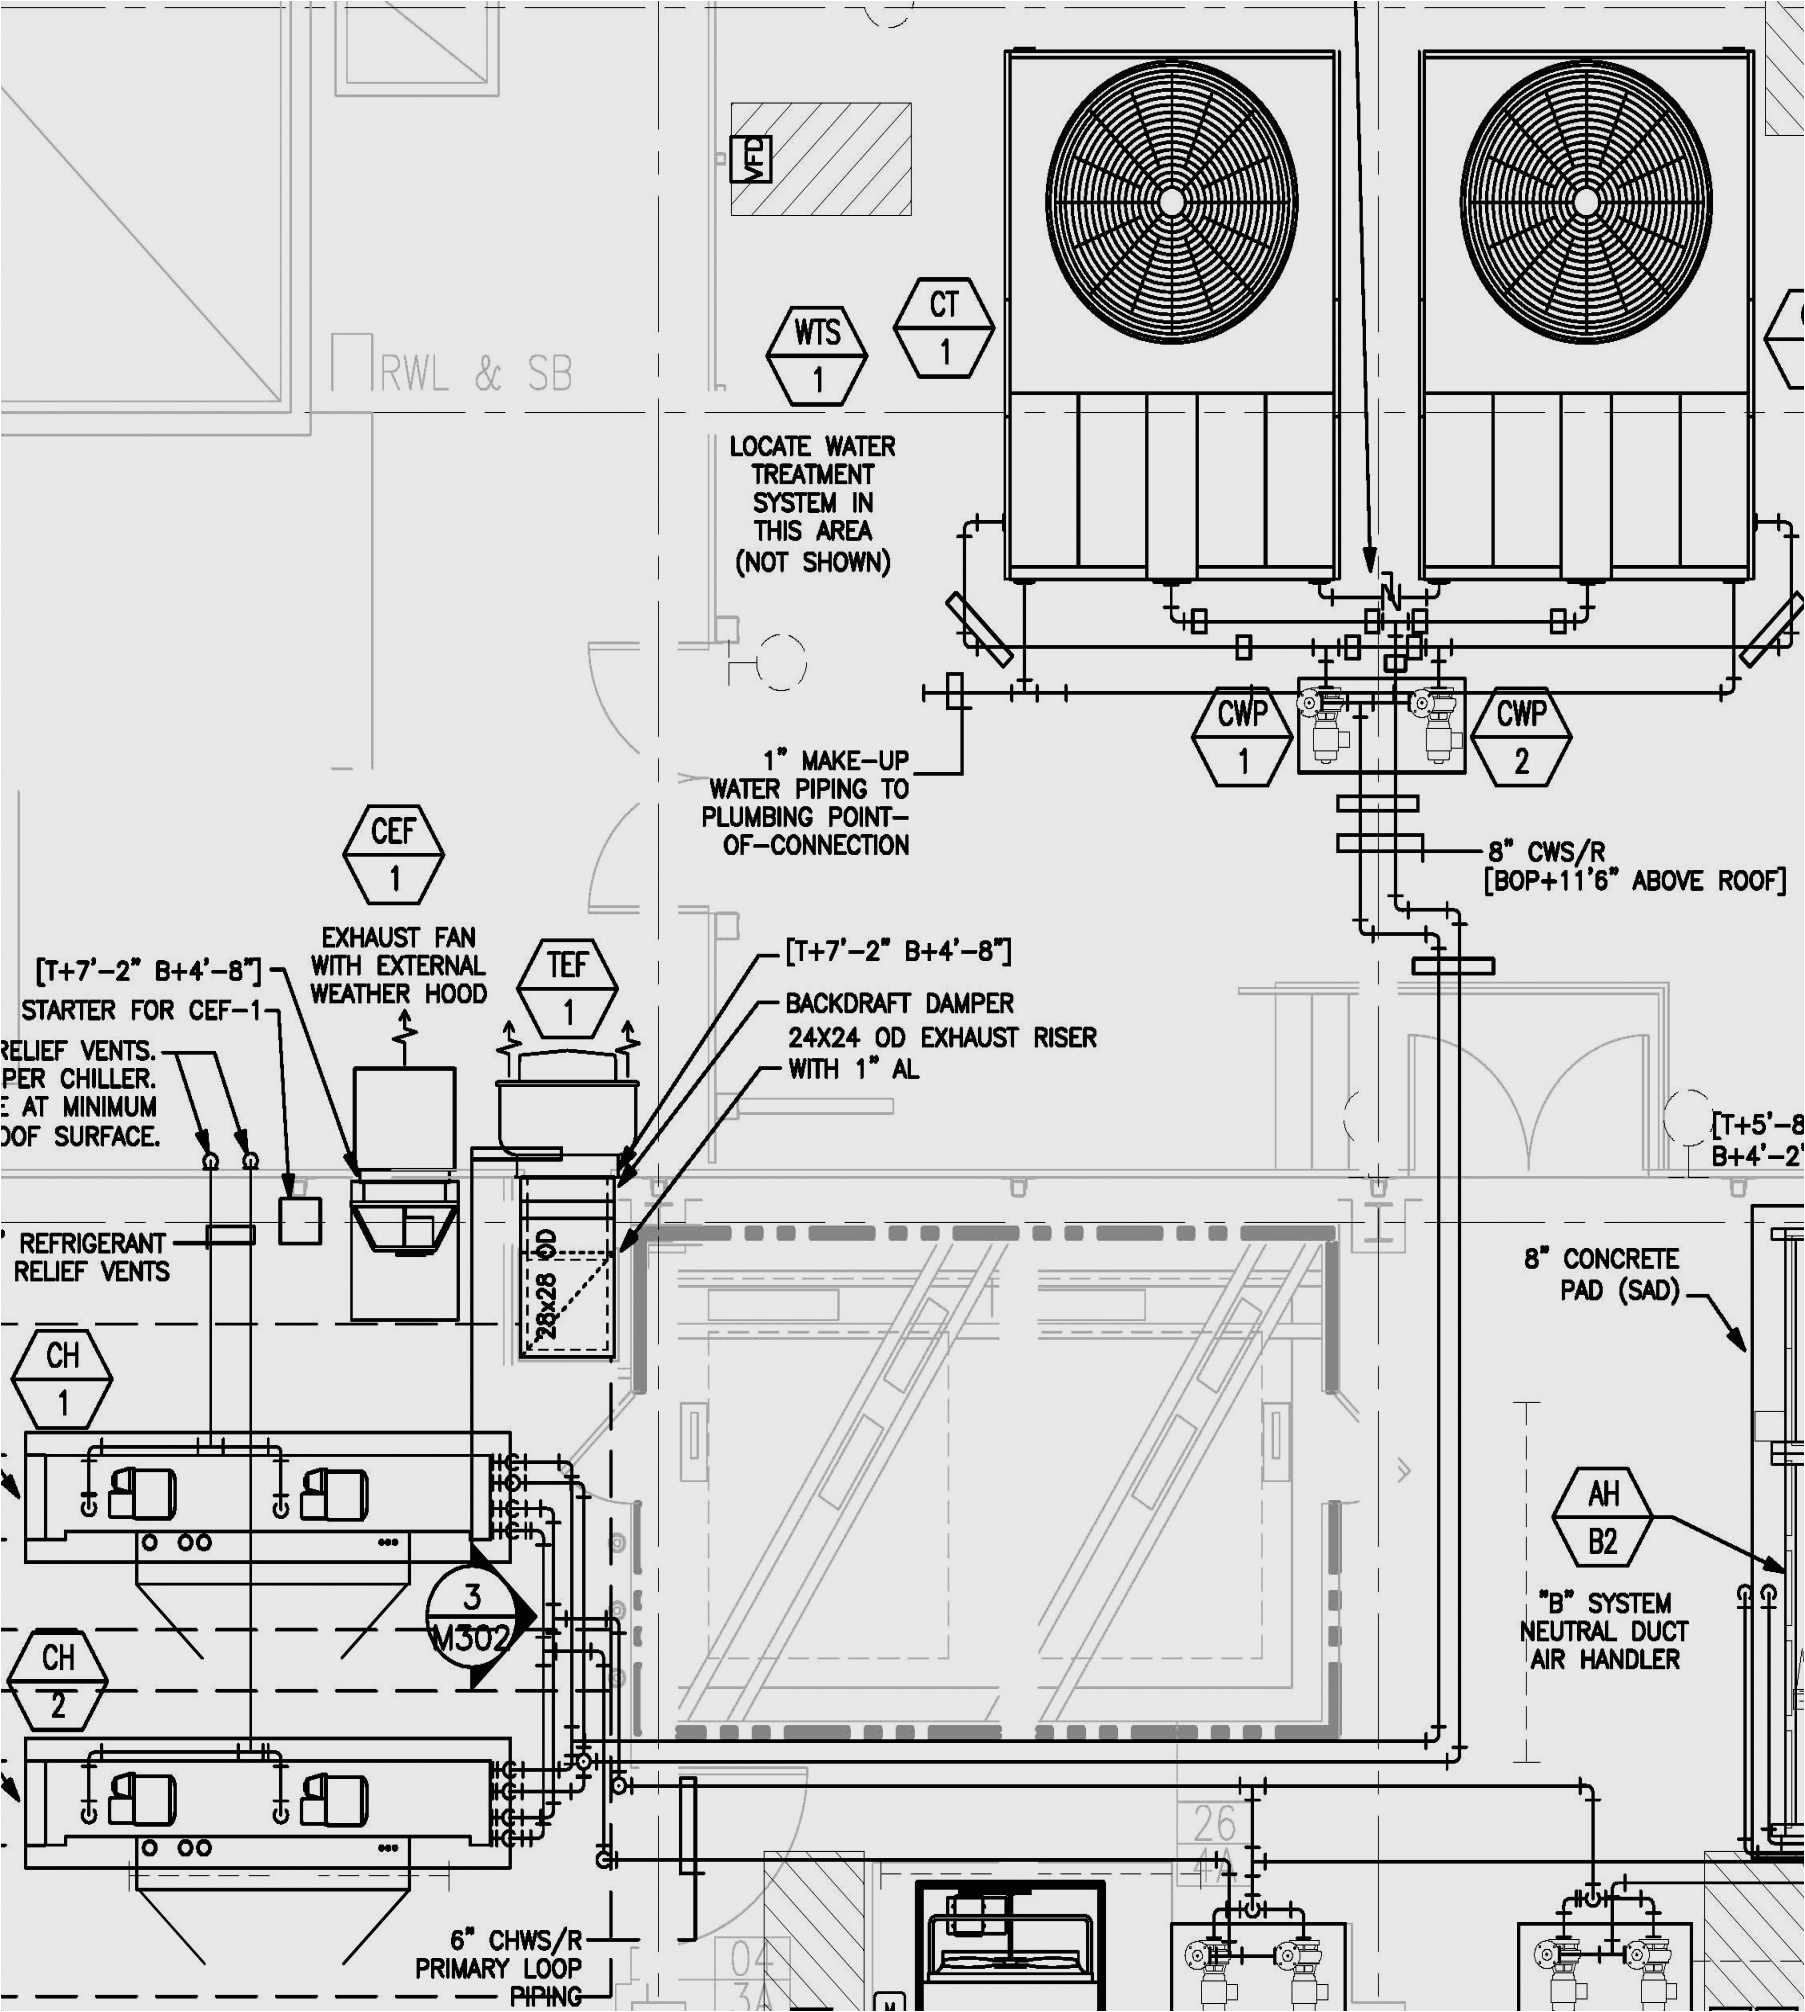 wiring diagram rainbow thermostat 2 wire thermostat wiring diagram underfloor heating thermostat wiring diagram incubator thermostat wiring diagram